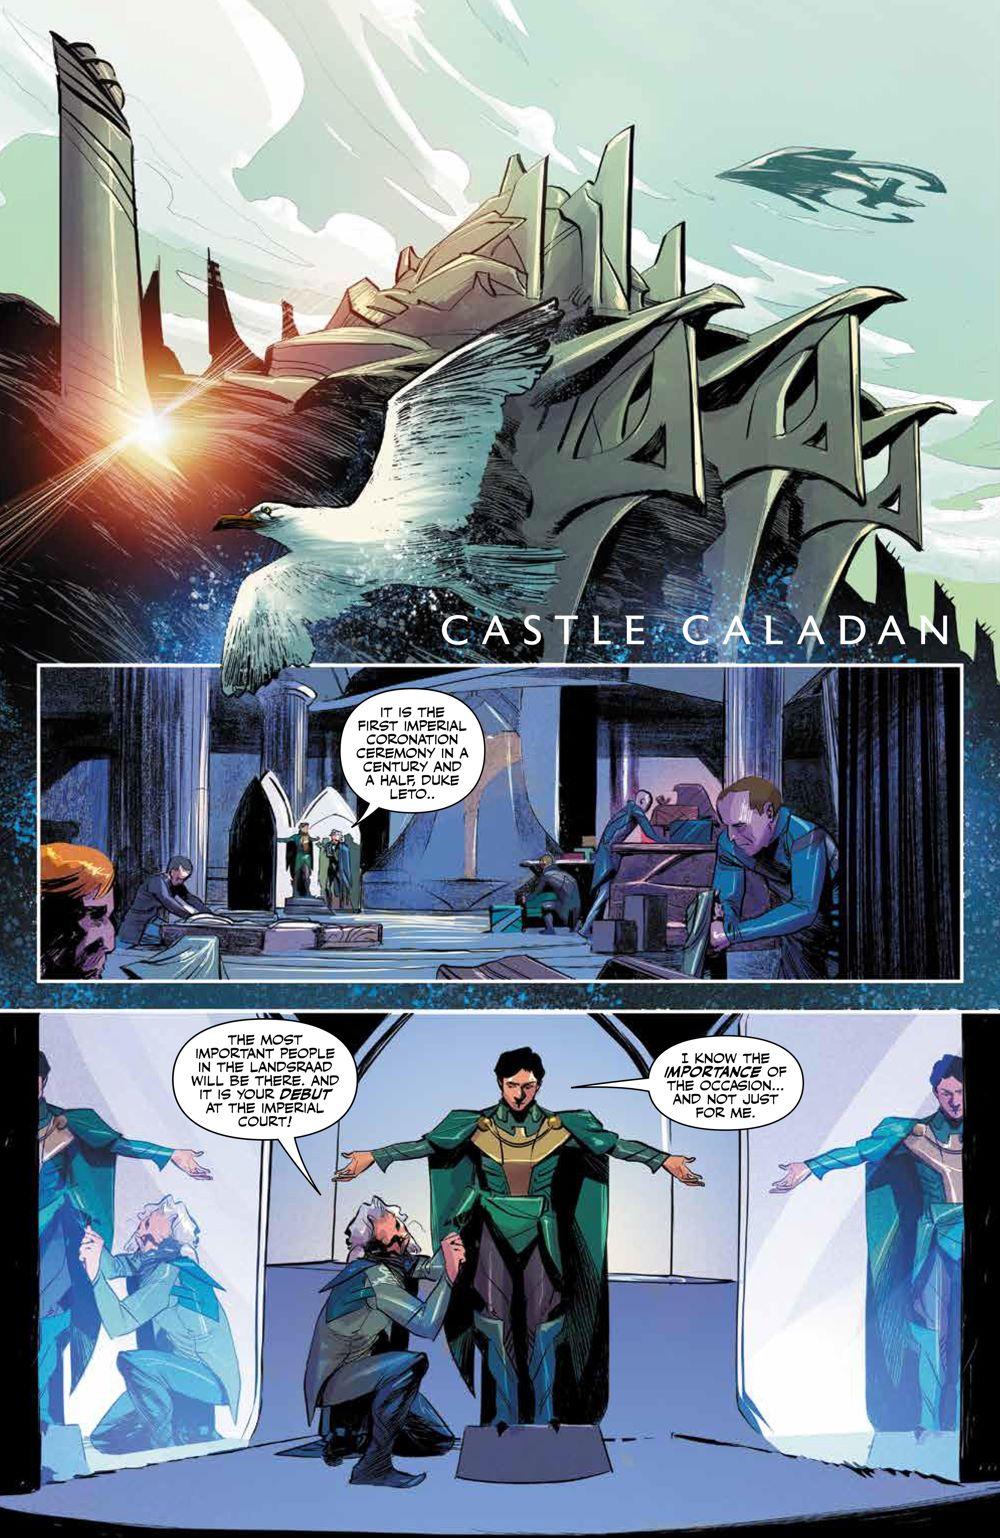 Dune_HouseAtreides_010_PRESS_3 ComicList Previews: DUNE HOUSE ATREIDES #10 (OF 12)